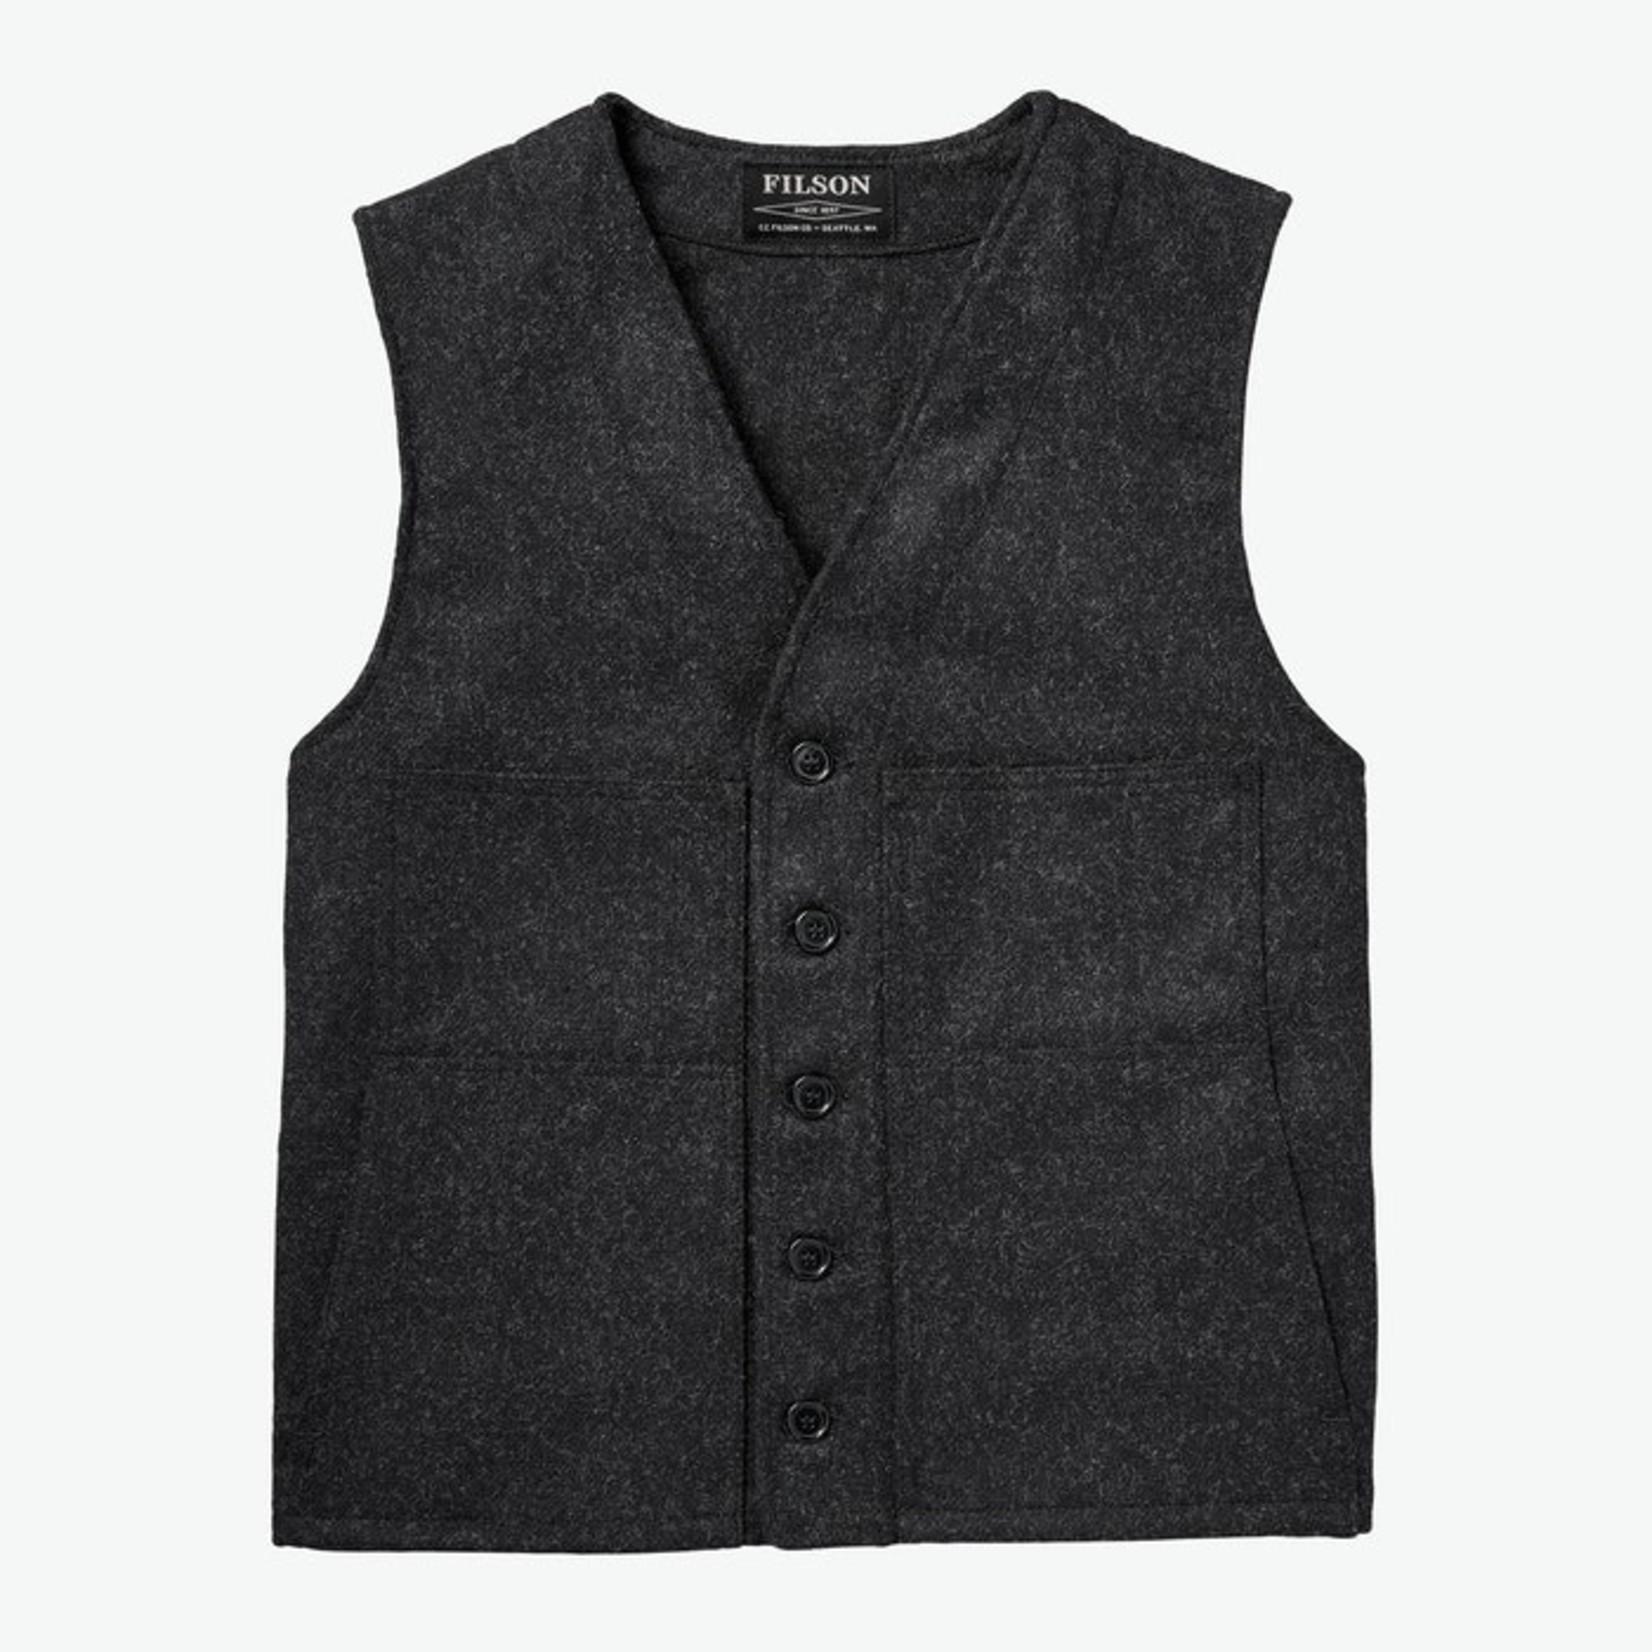 Filson Filson 11010055 Mackinaw Wool Vest - Charcoal